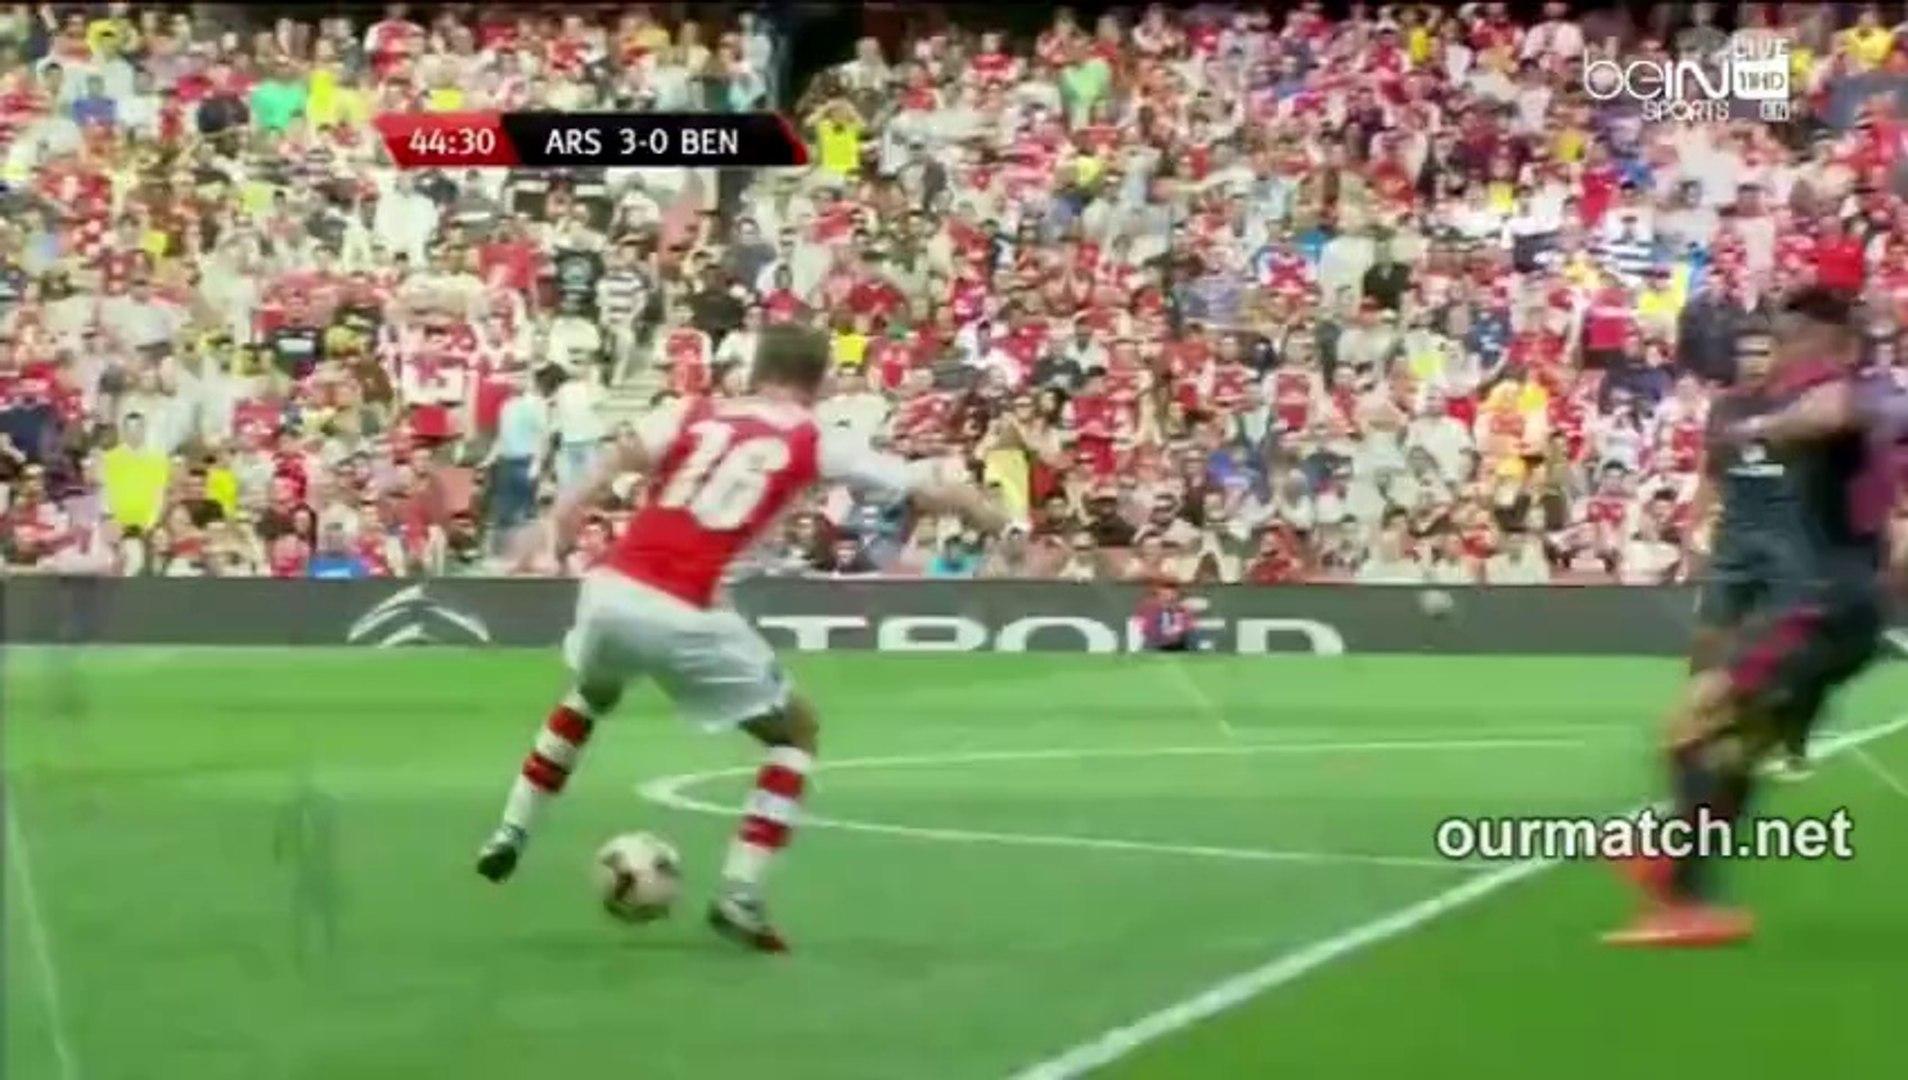 Arsenal 3-0 Benfica (Sanogo Goal) ourmatch.net